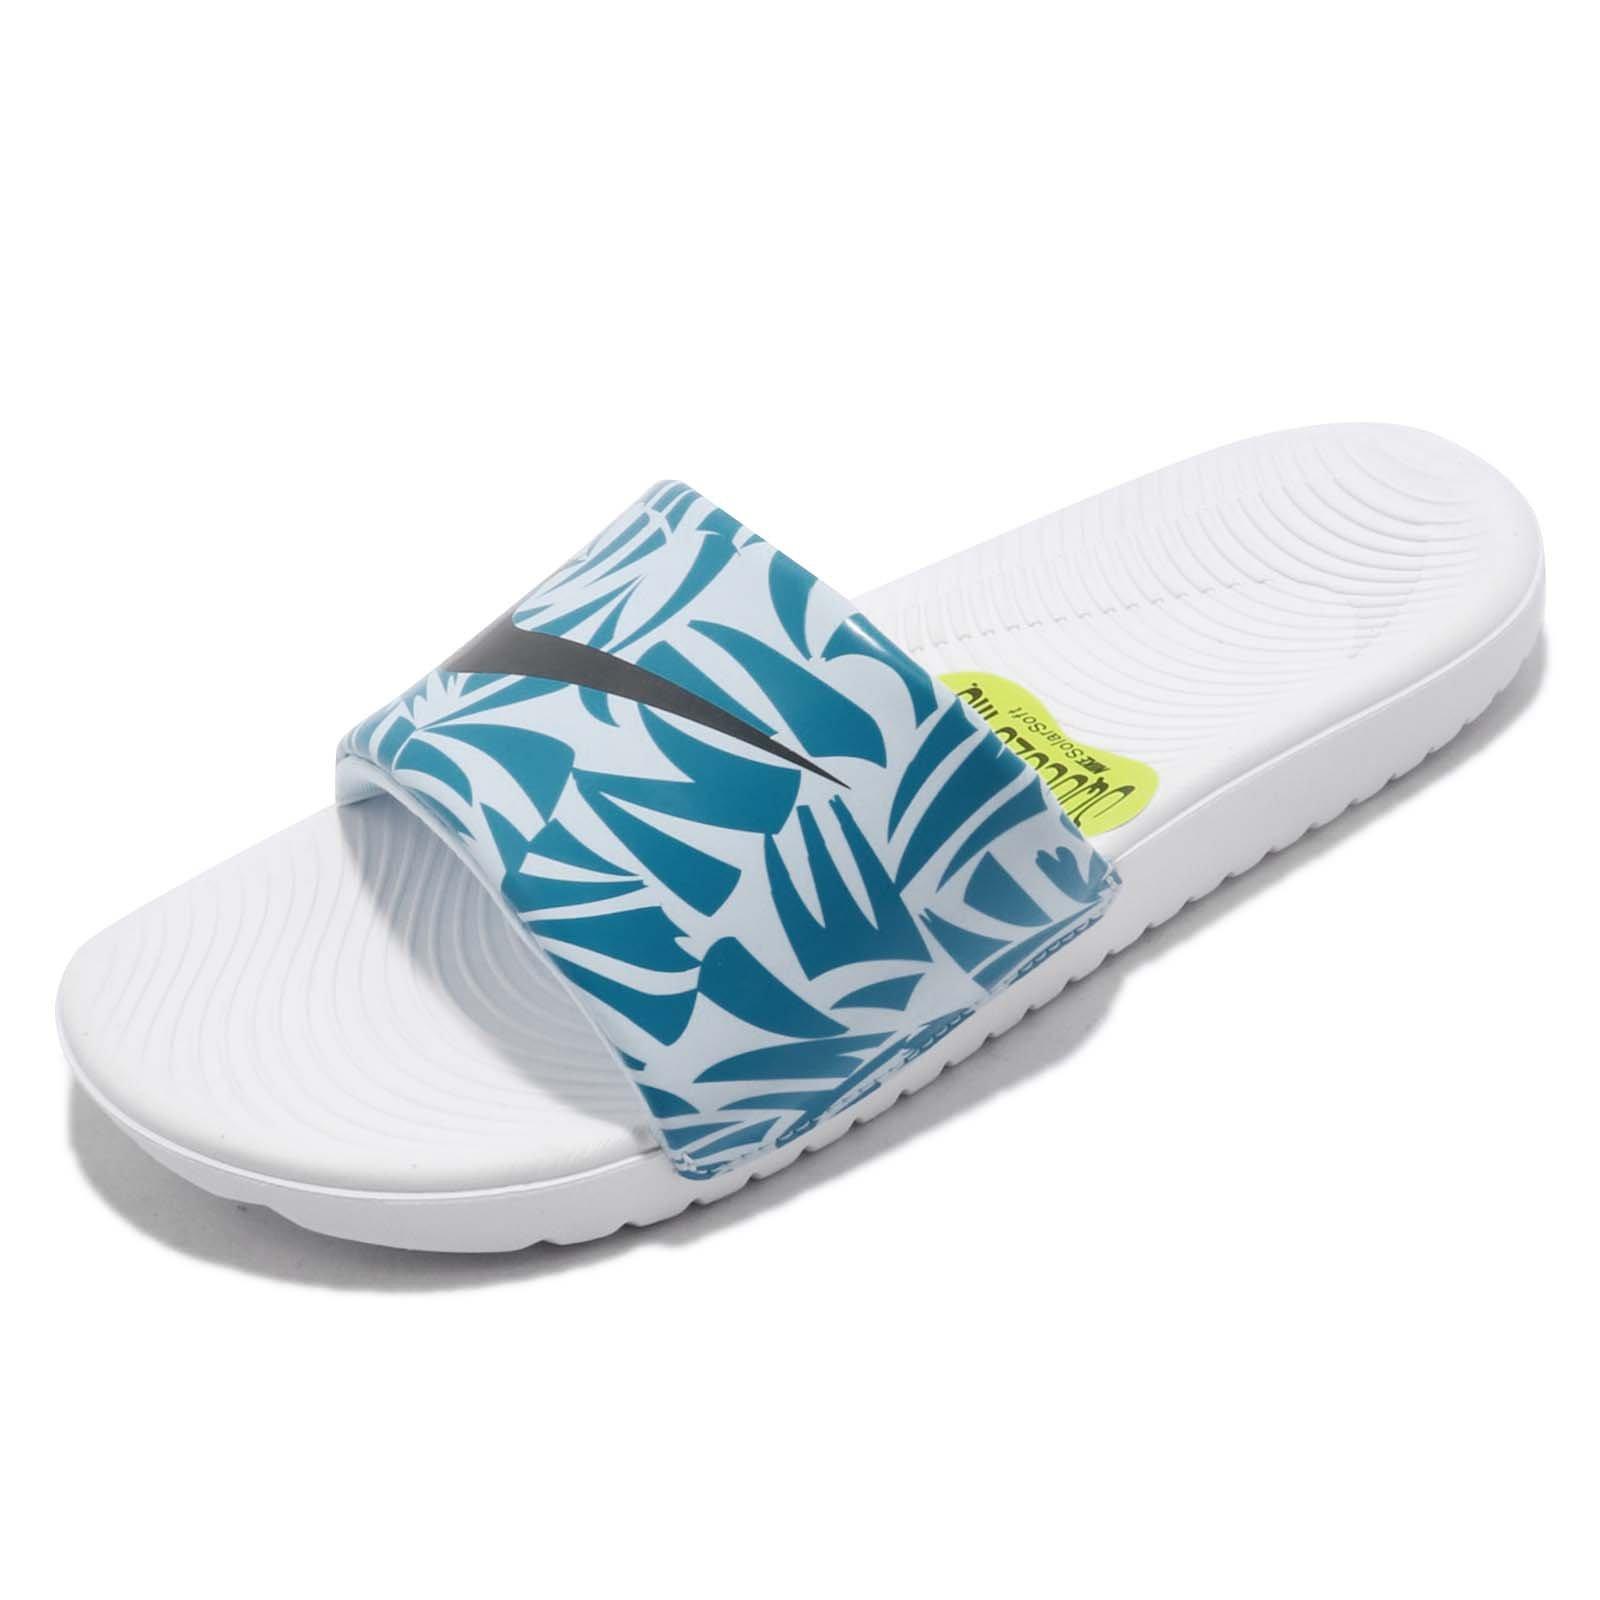 NIKE Girl's Kawa Print Slide Sandals, White/Anthracite-Neo Turq-Cobalt Print, 7Y